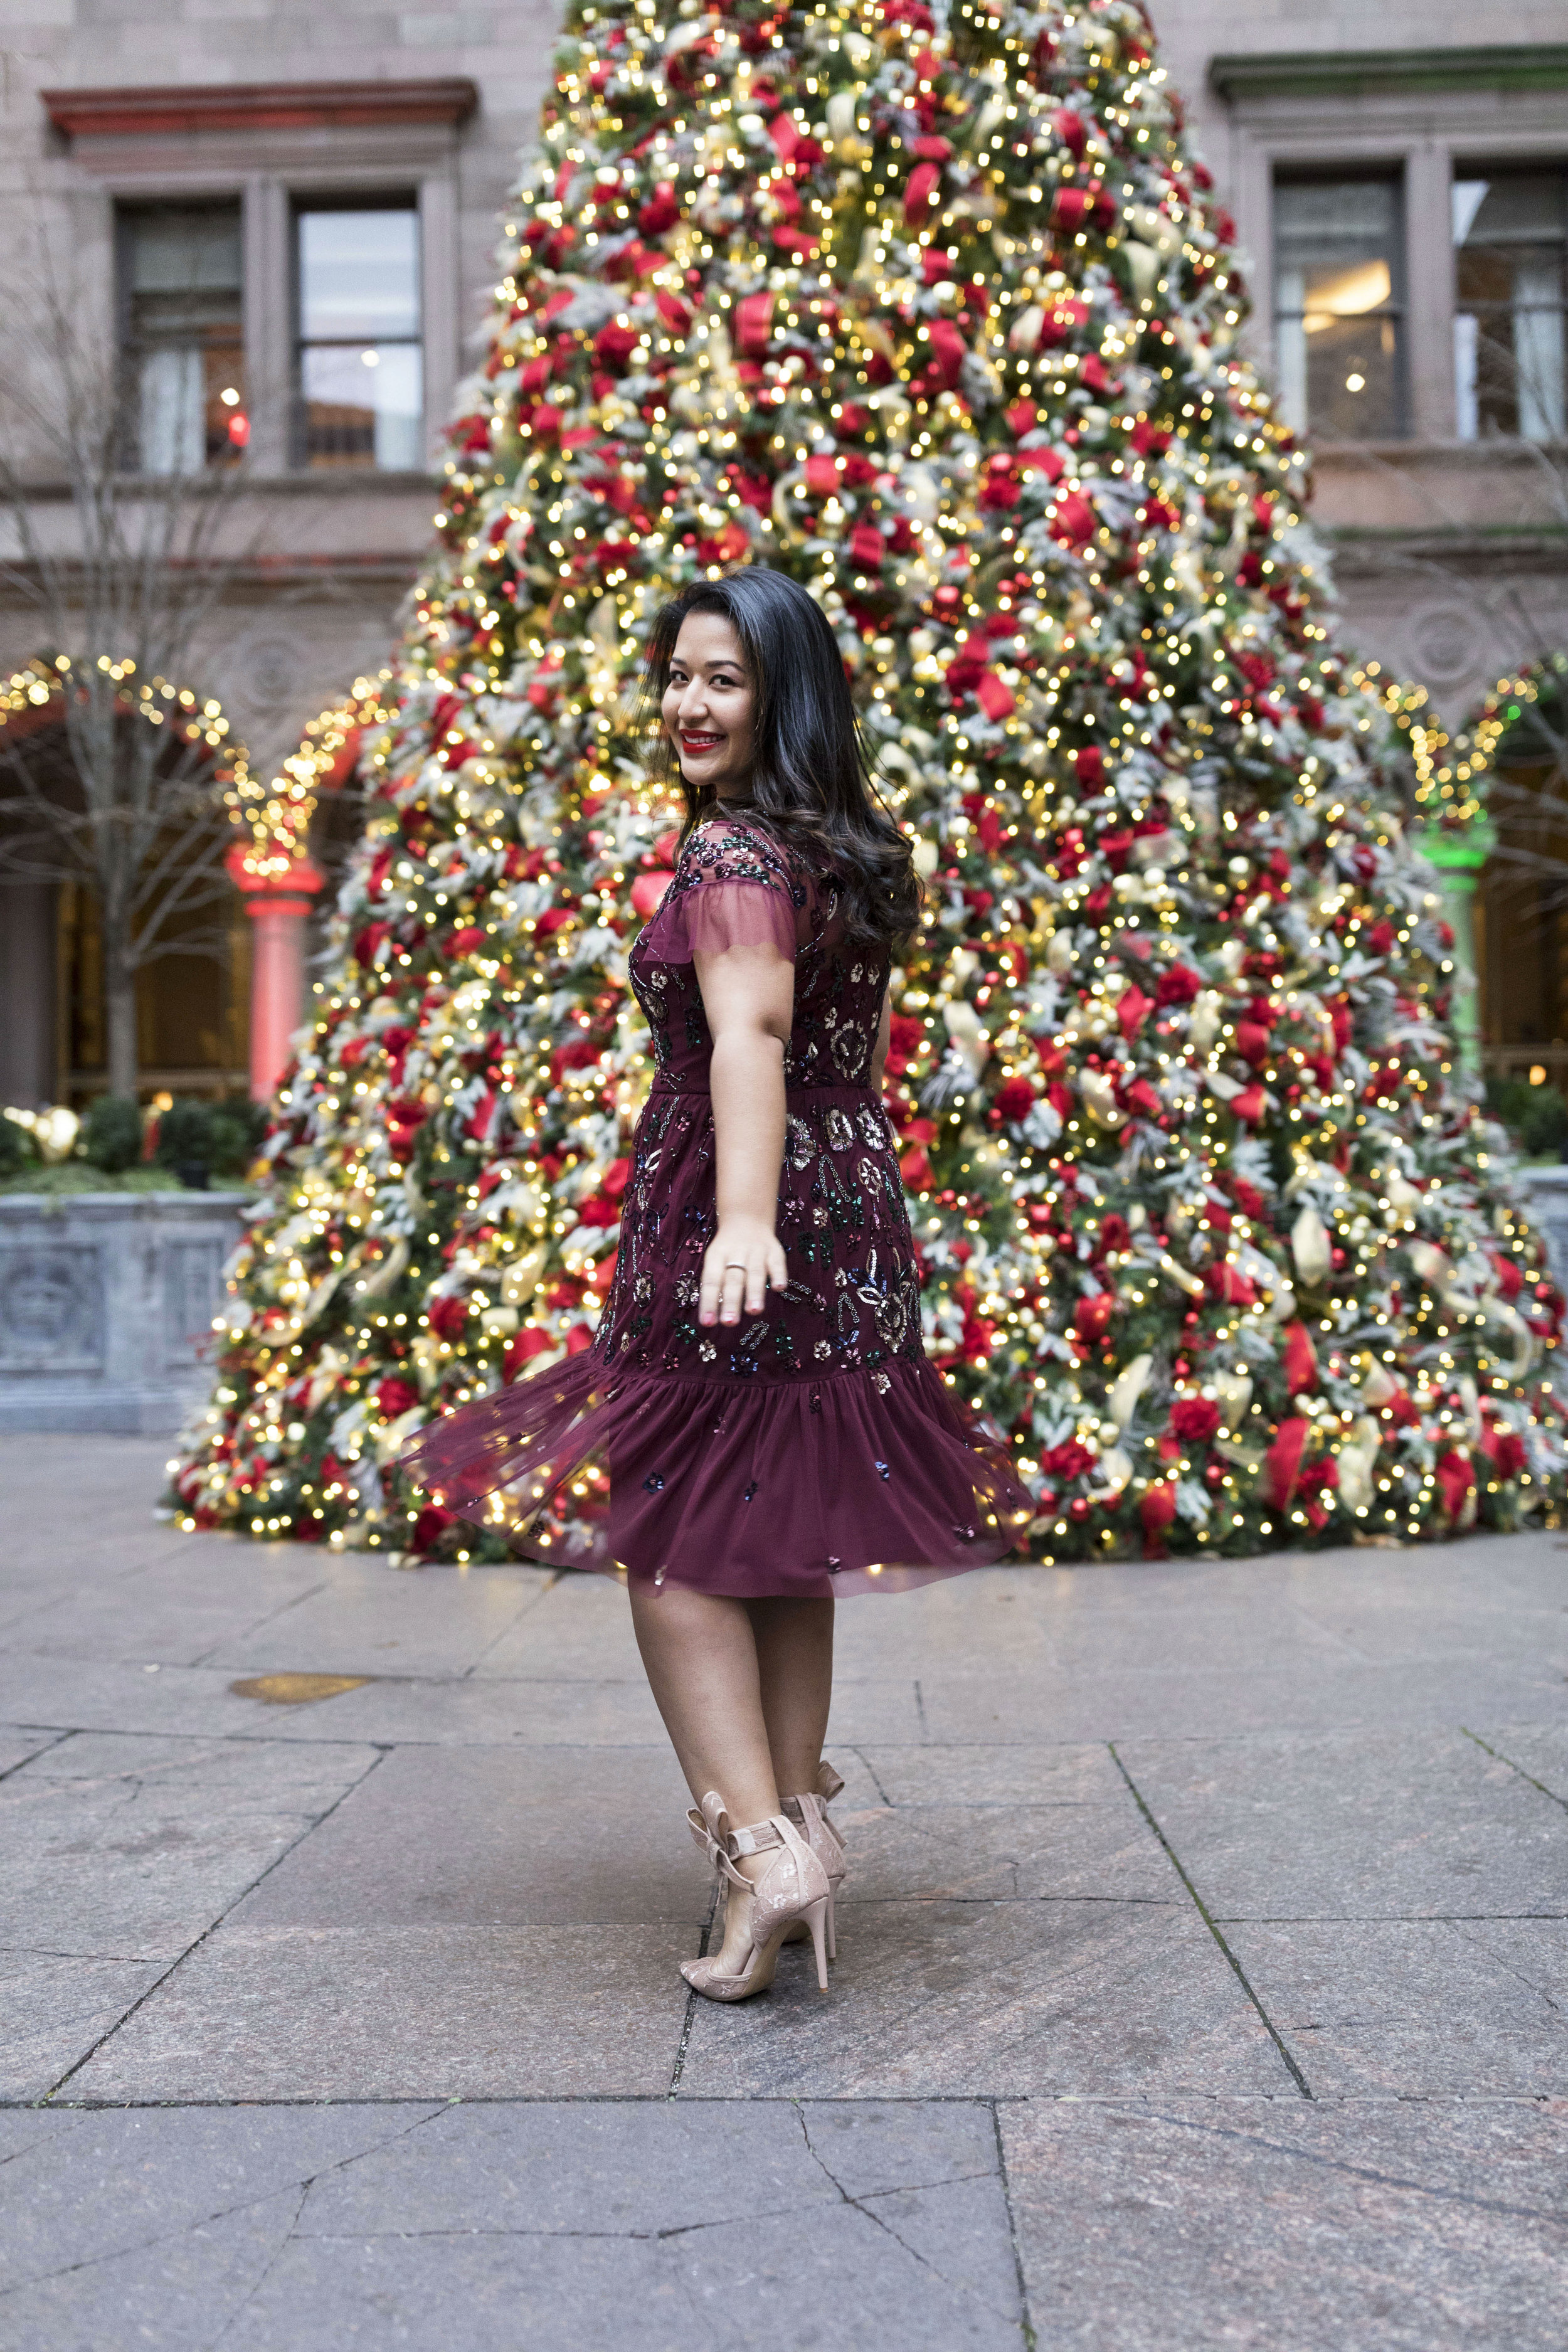 Krity S x Holiday Outfit x Aidan Beaded Burgundy Short Dress13.jpg